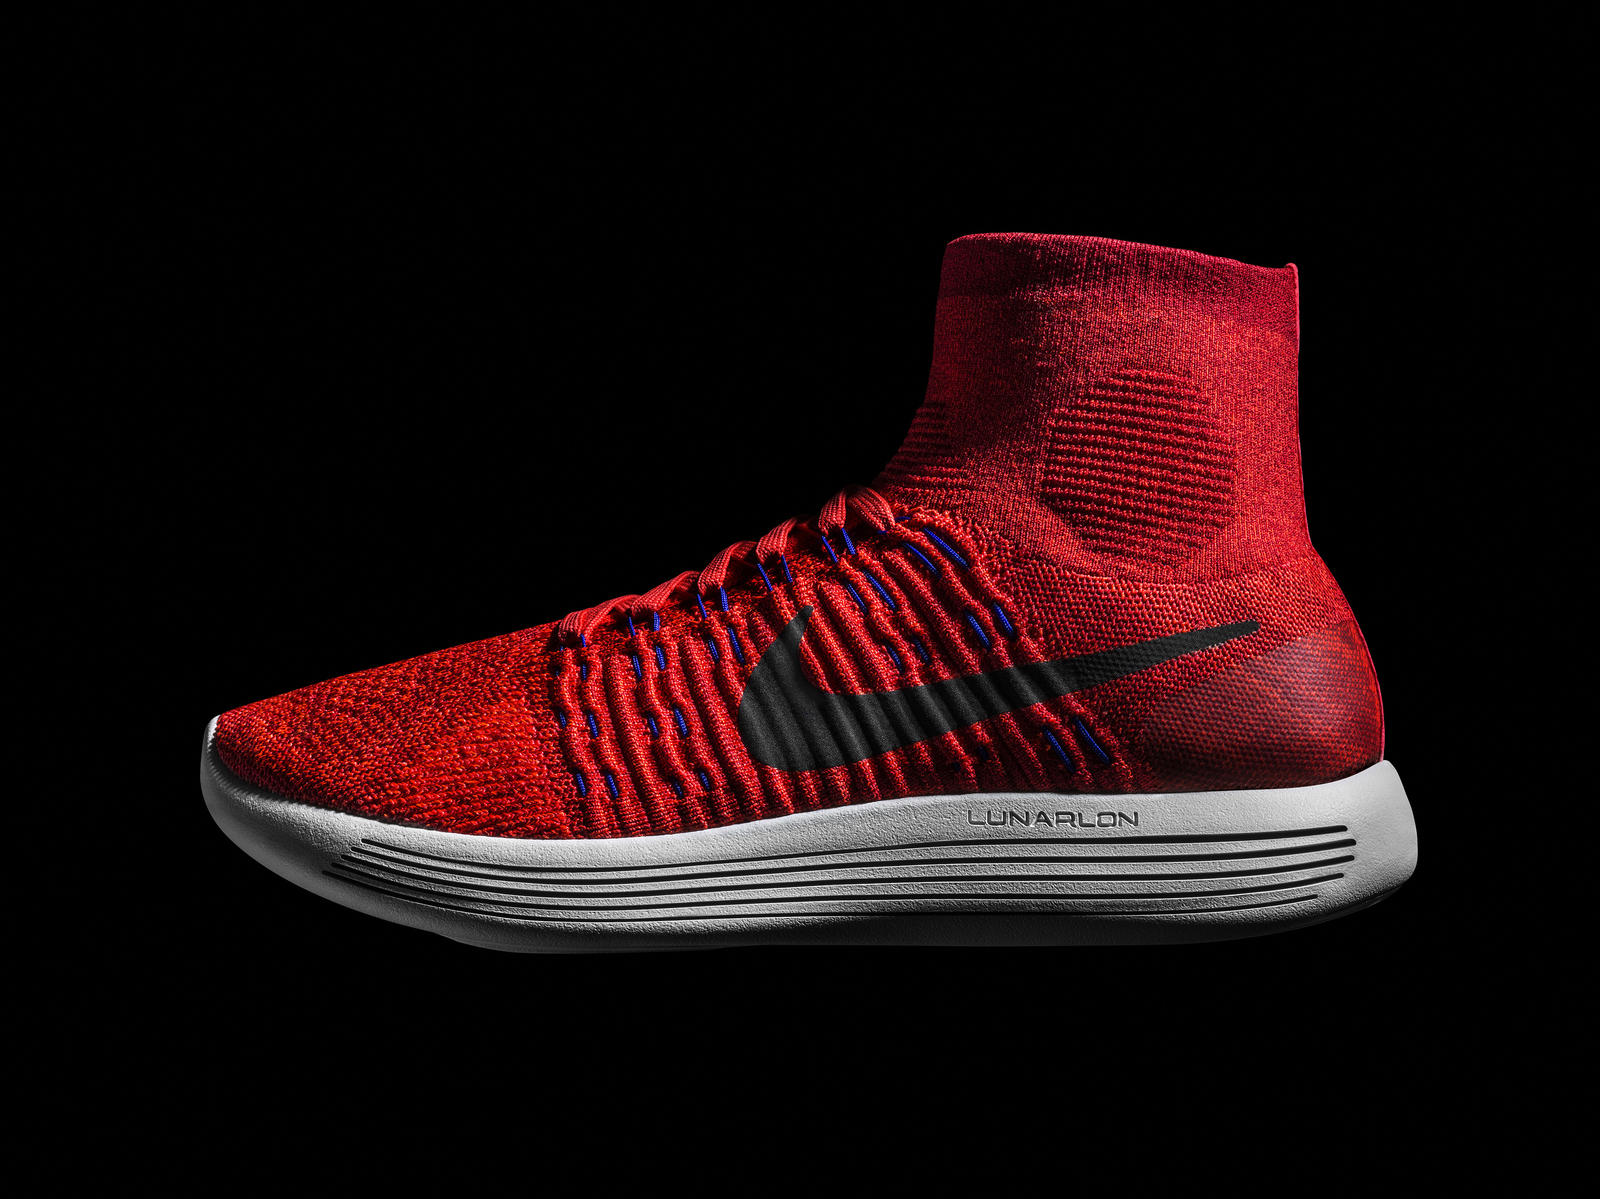 the best attitude 939e0 3d325 Nike LunarEpic Flyknit : le futur du running ?